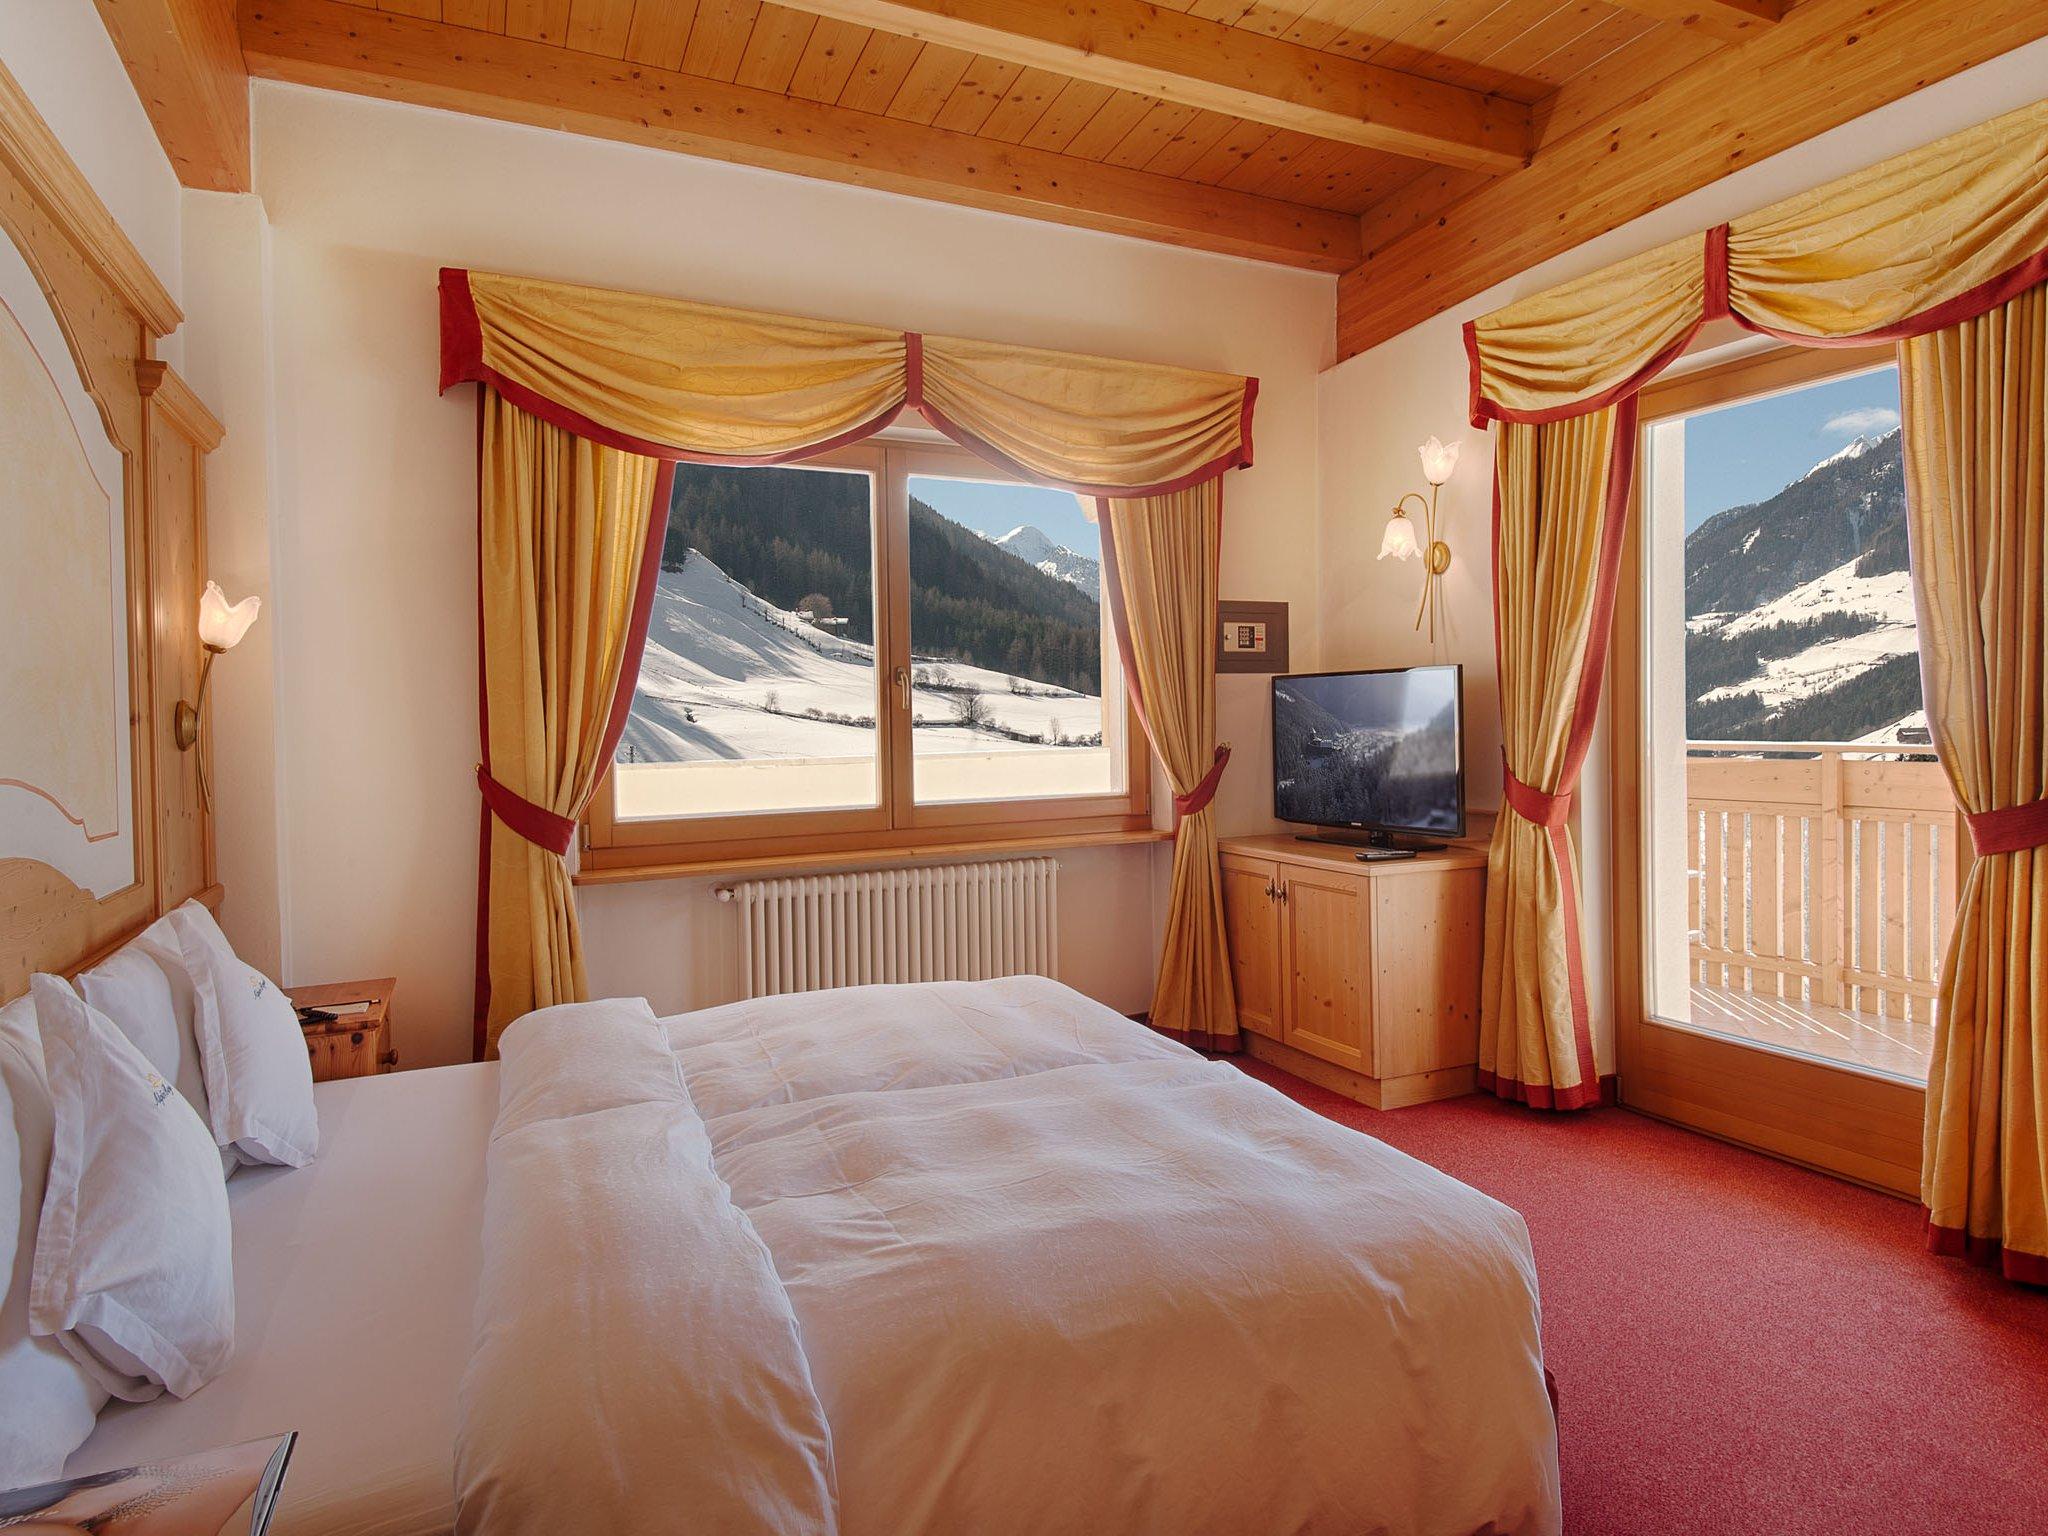 Alpin kamer 1